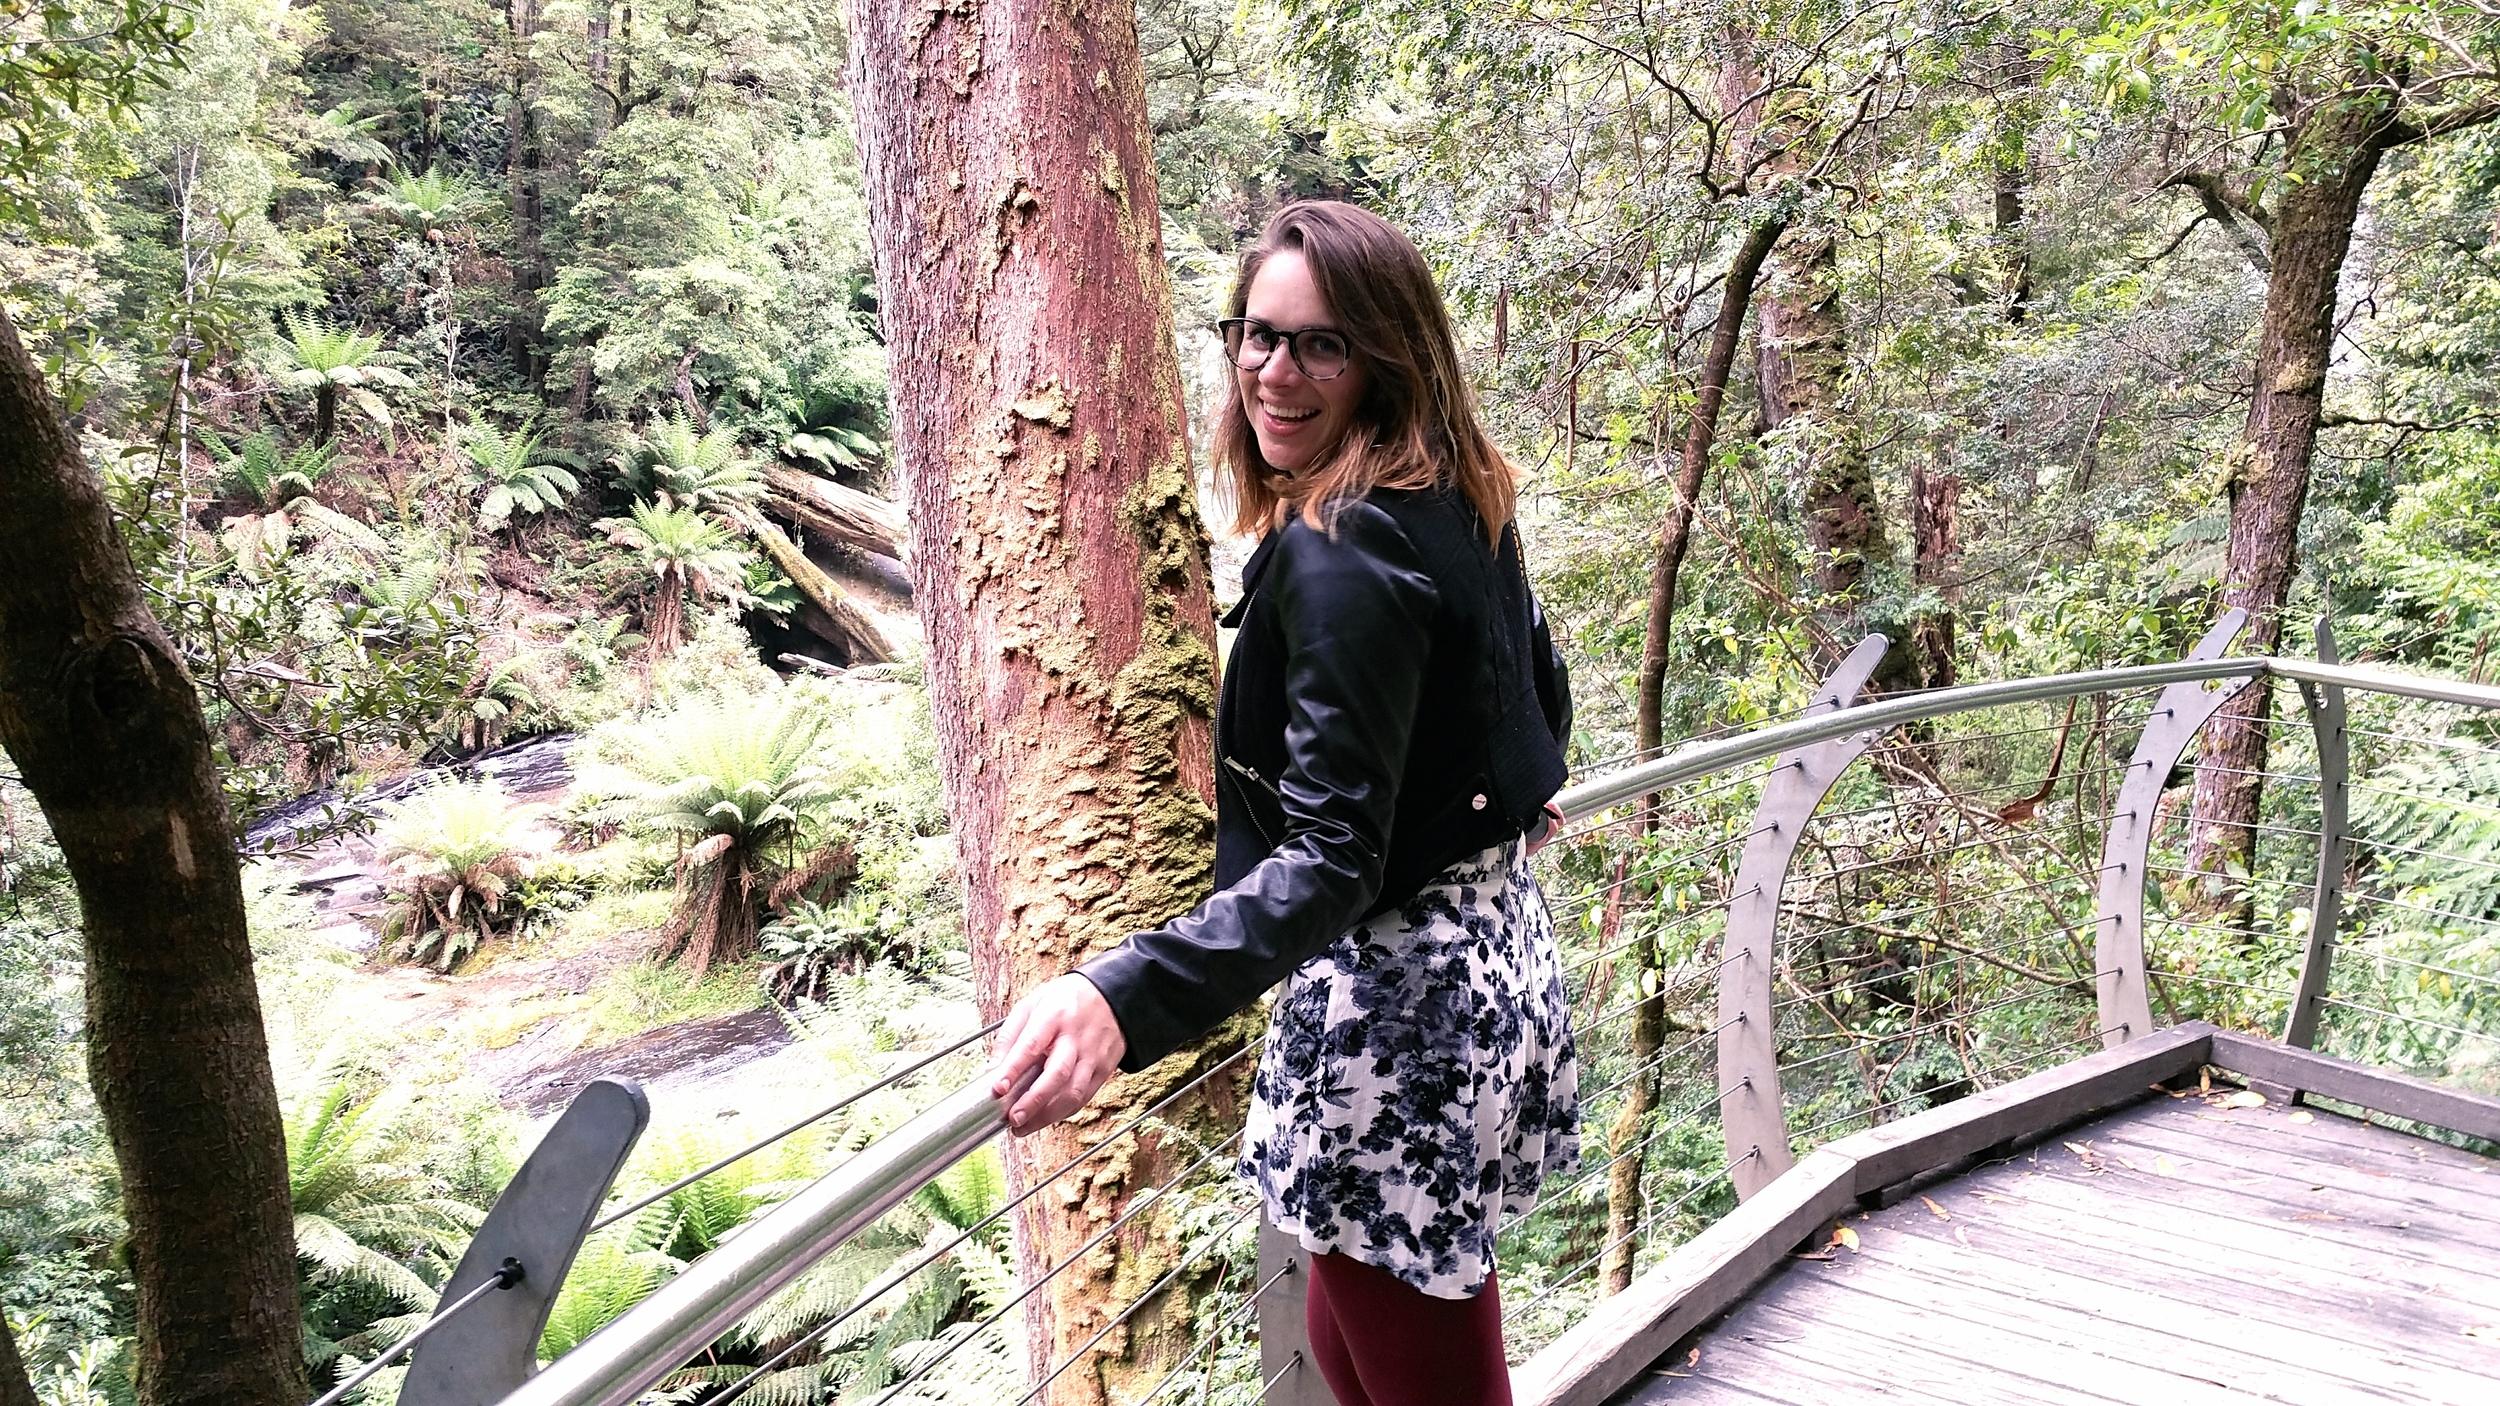 otway-rainforest-floral-shorts-leather-jacket